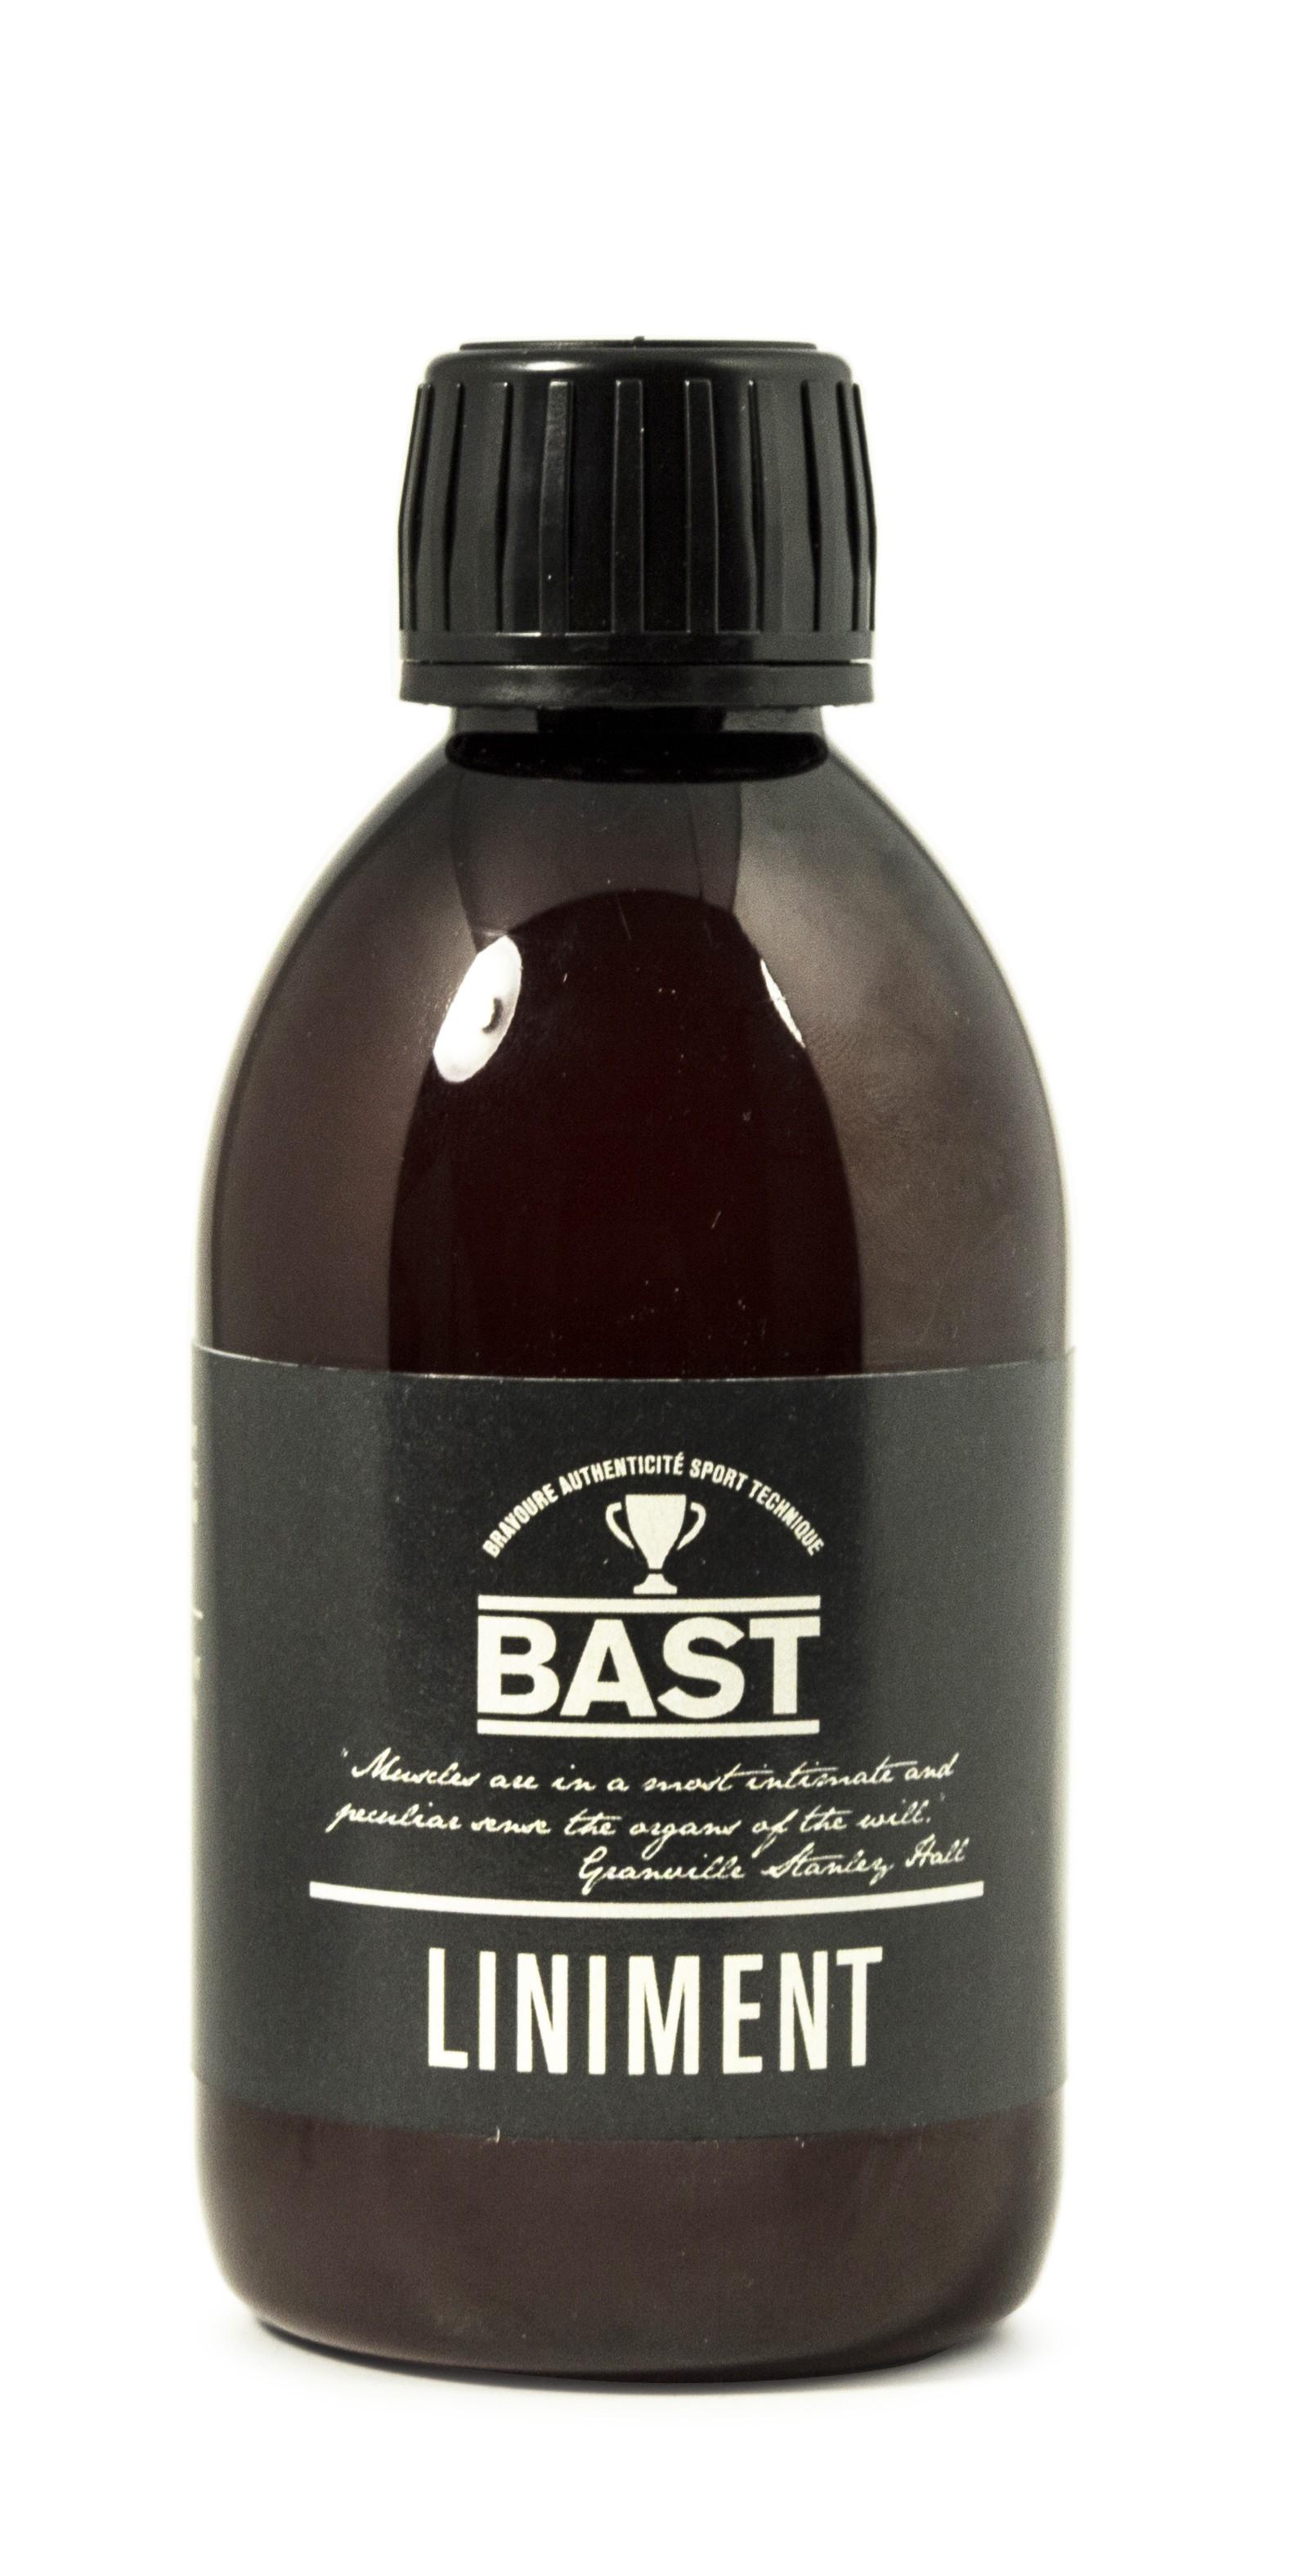 Liniment - BAST